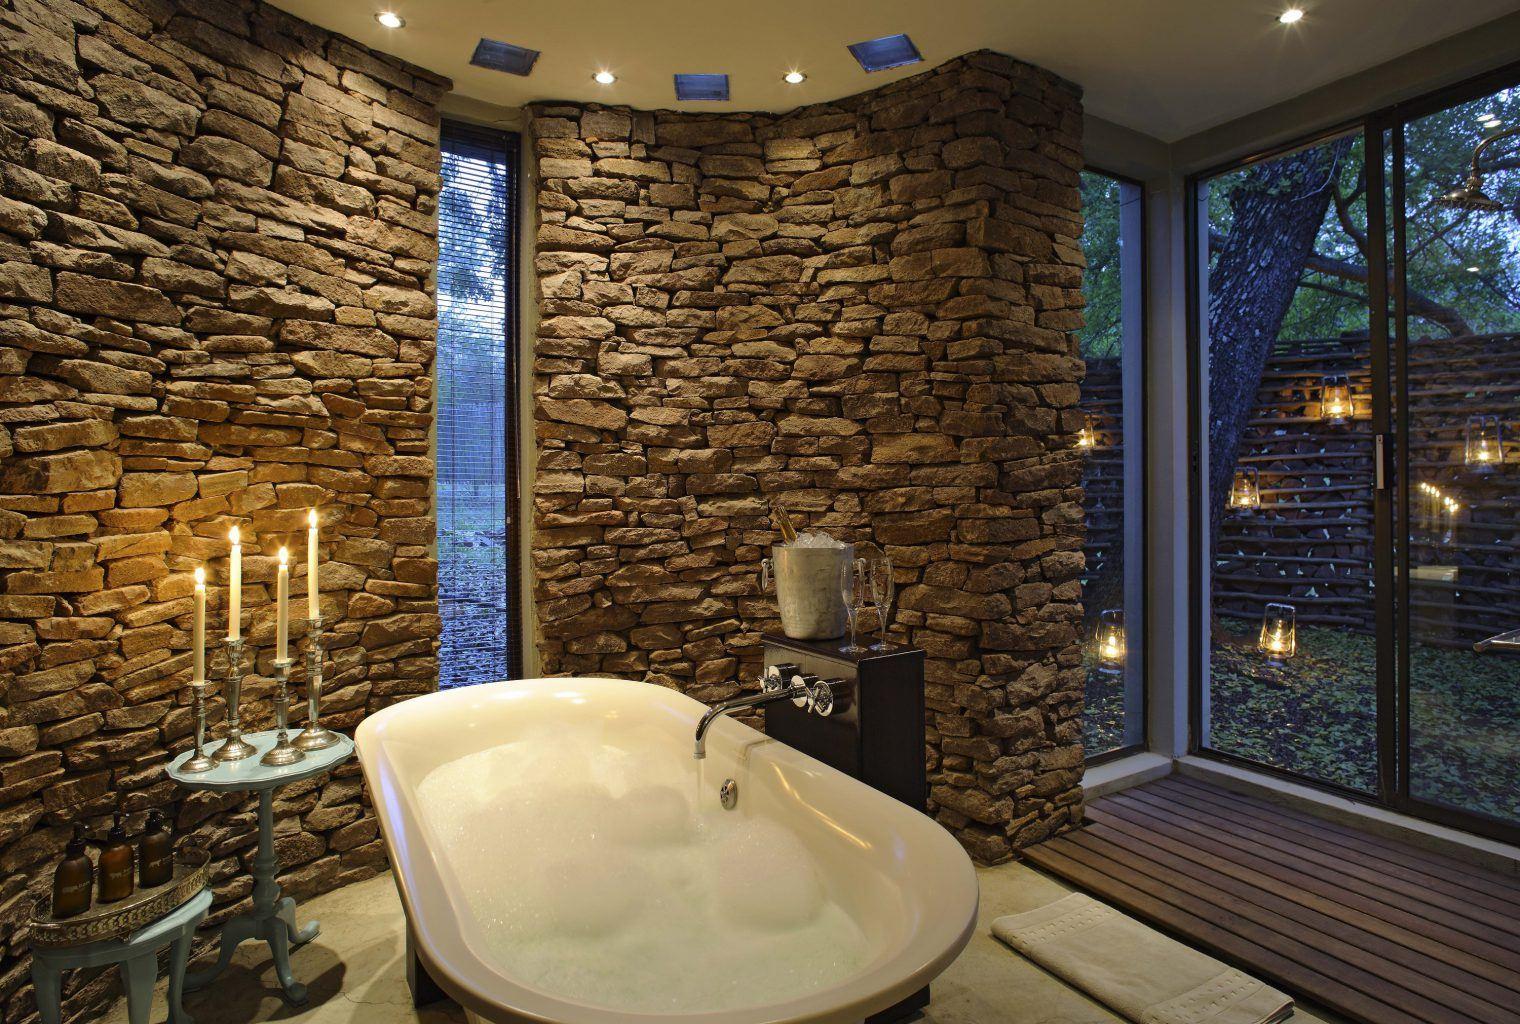 phinda-zuka-lodge-bathroo-1520x1024.jpg